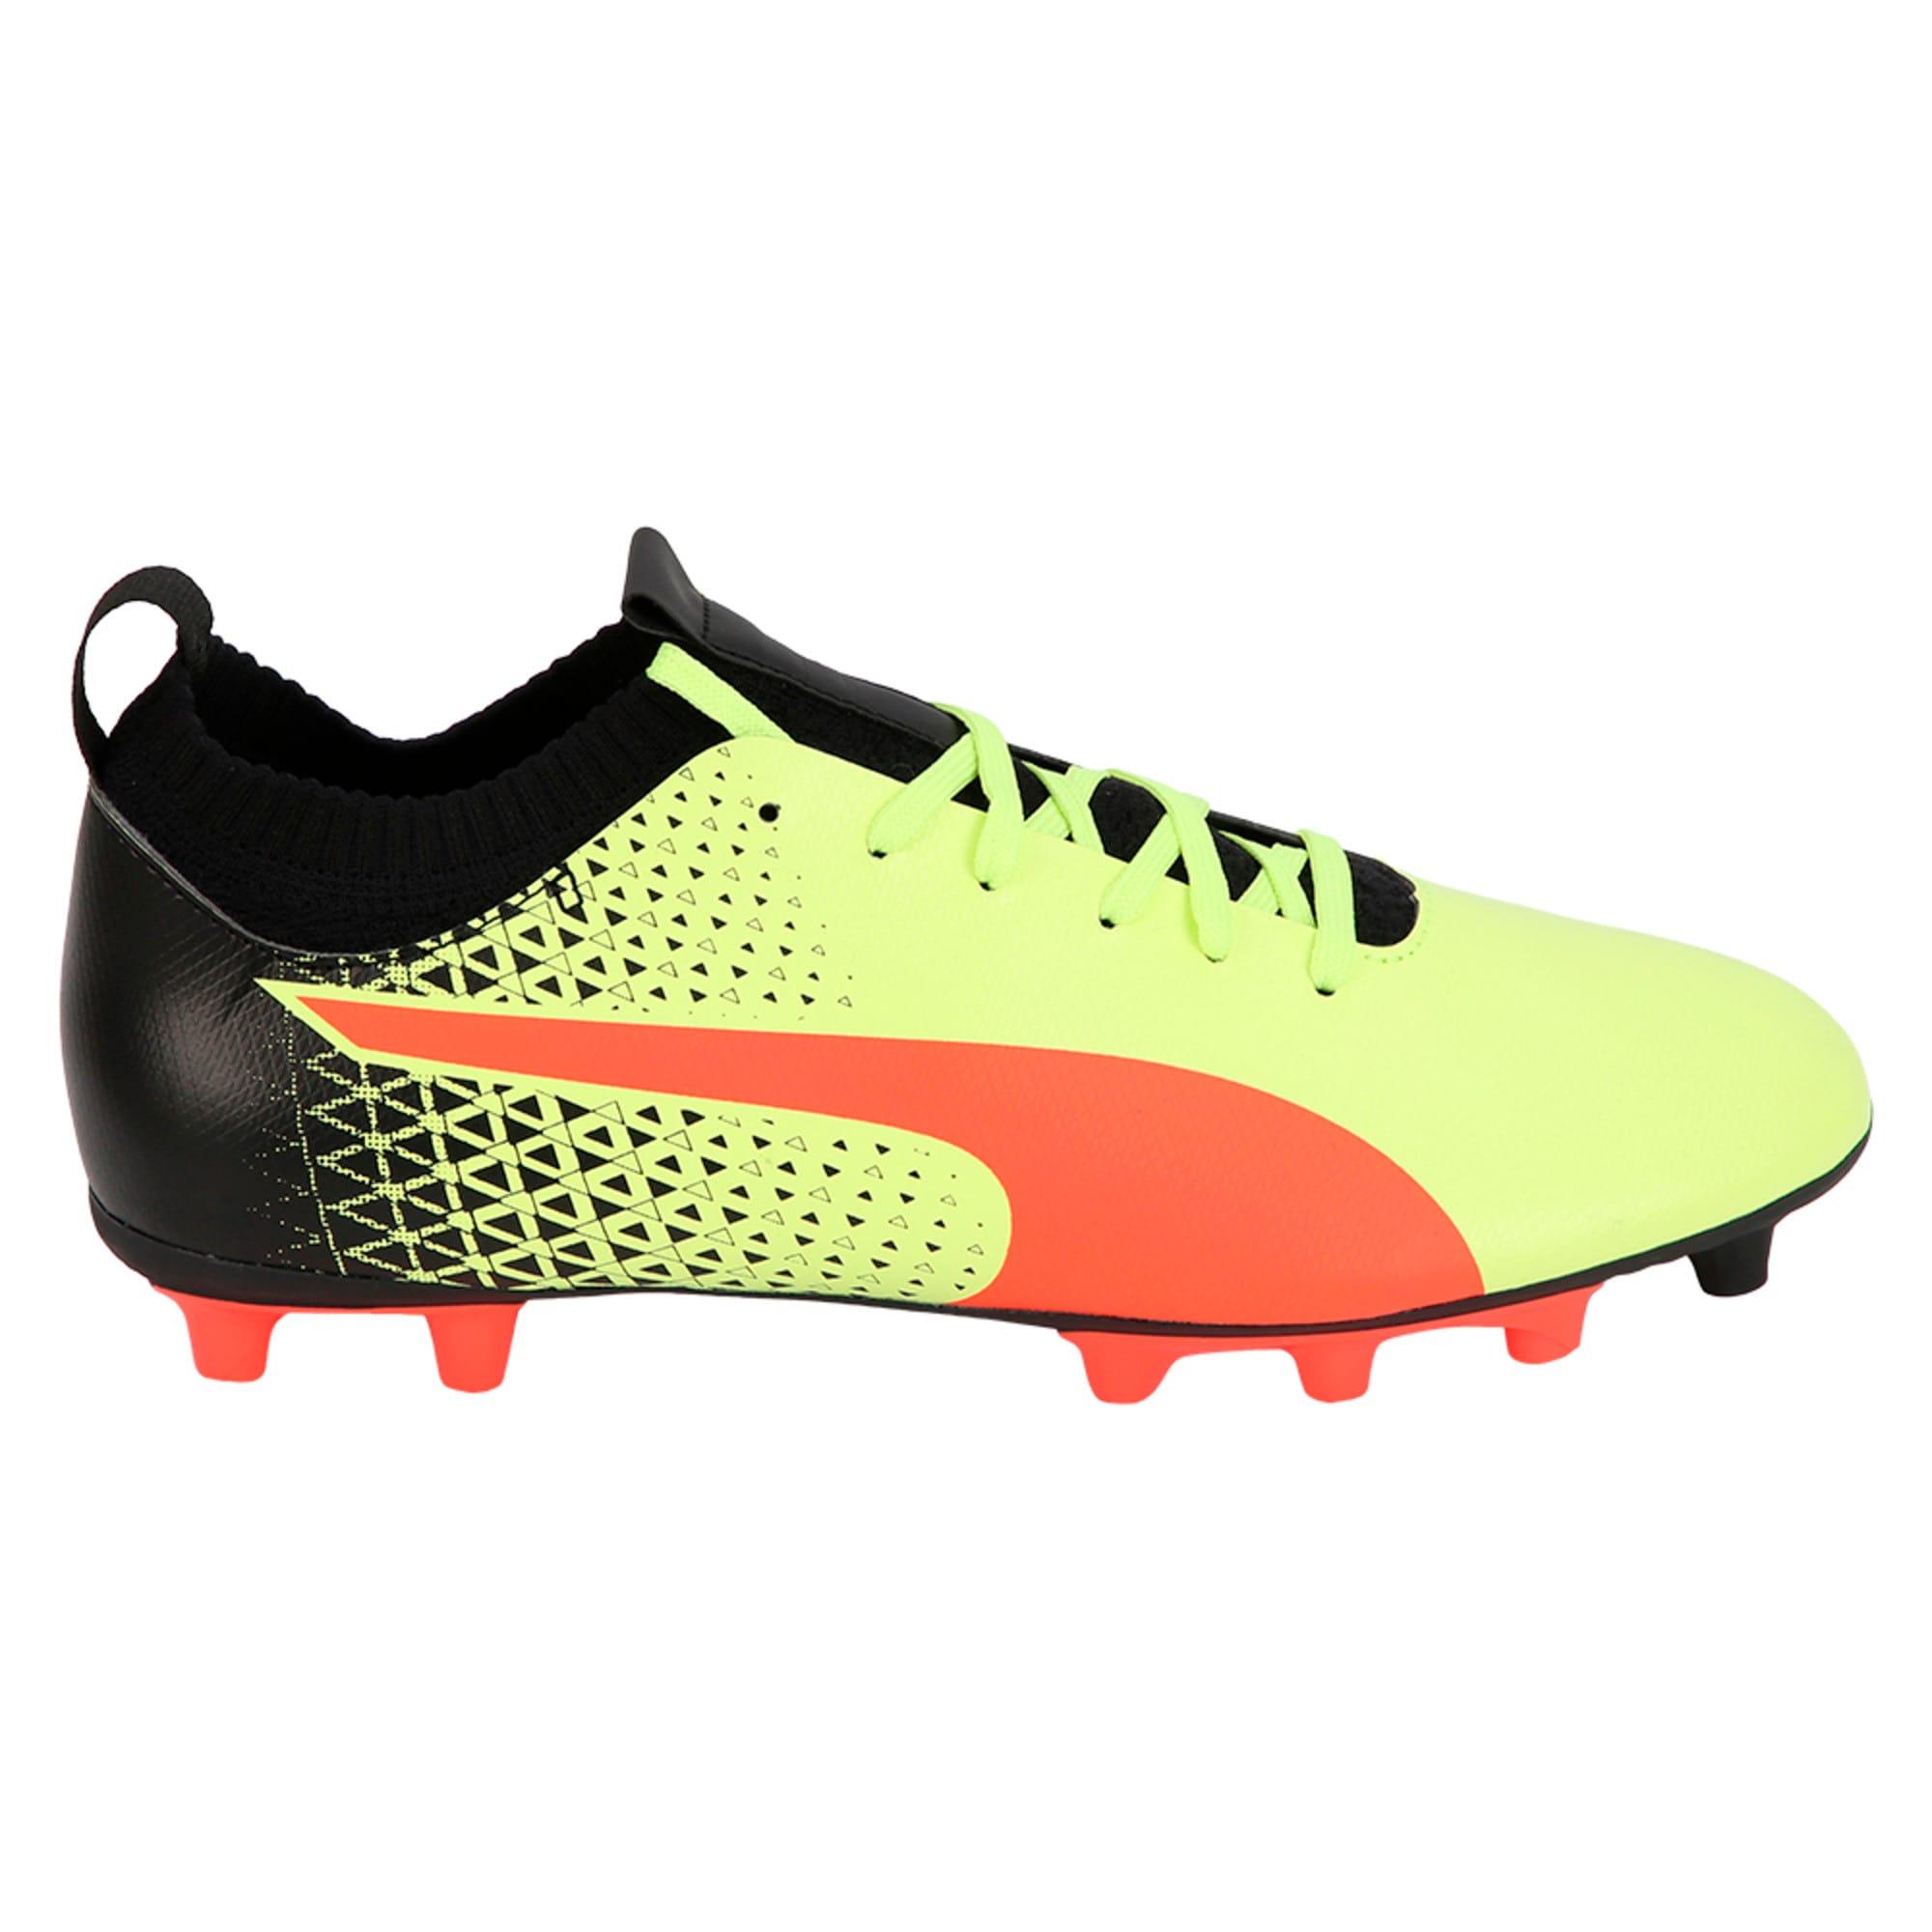 Thumbnail 3 of evoKNIT FG Men's Football Boots, Yellow-Red-Black, medium-IND